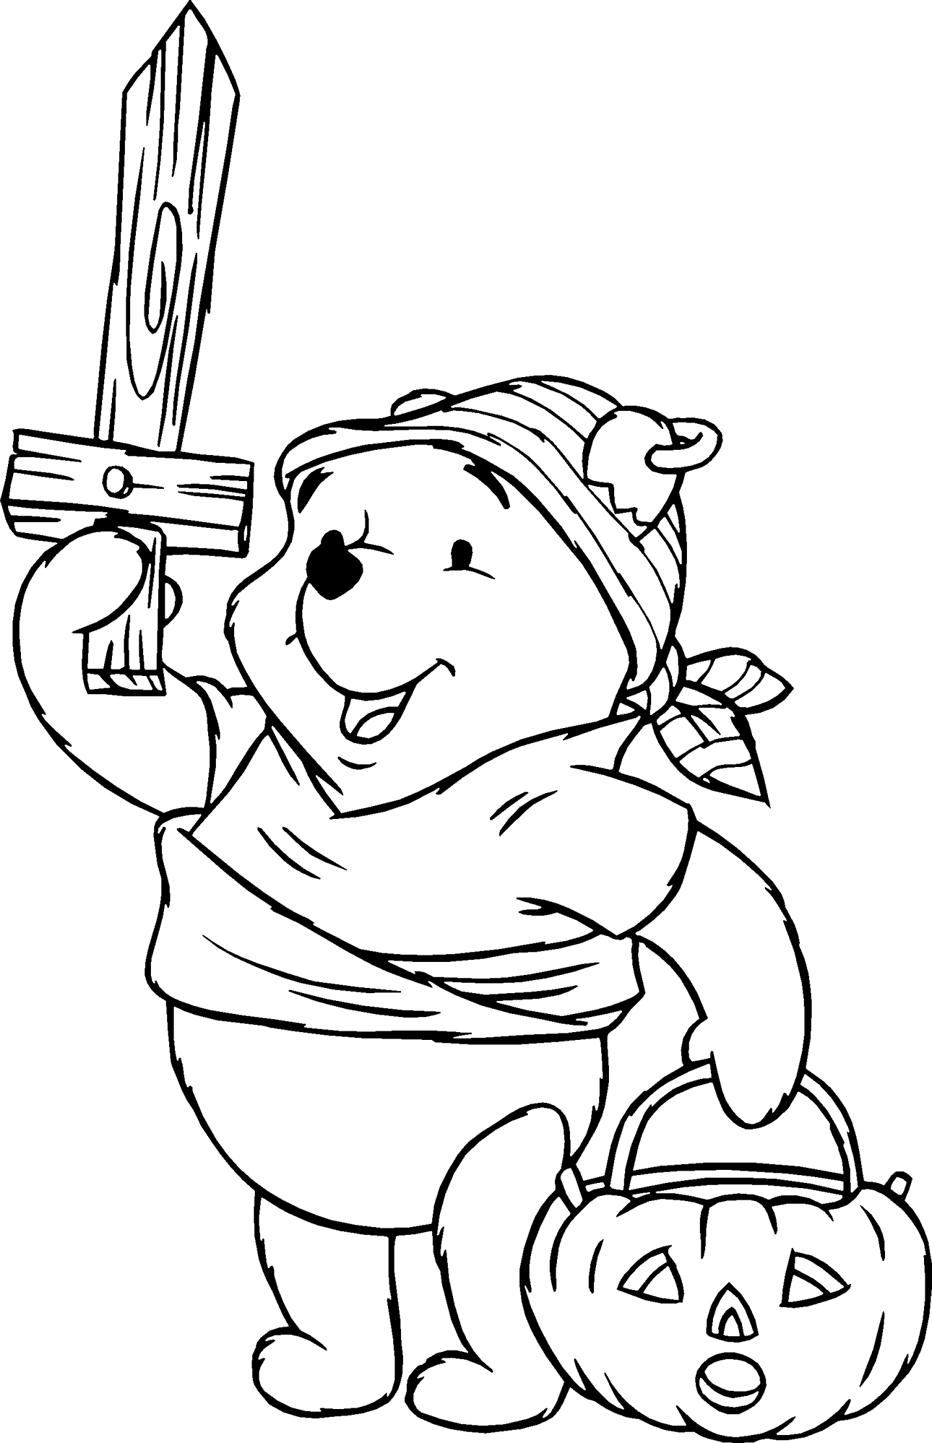 kids coloring pages printable printable raccoon coloring pages for kids cool2bkids pages printable kids coloring